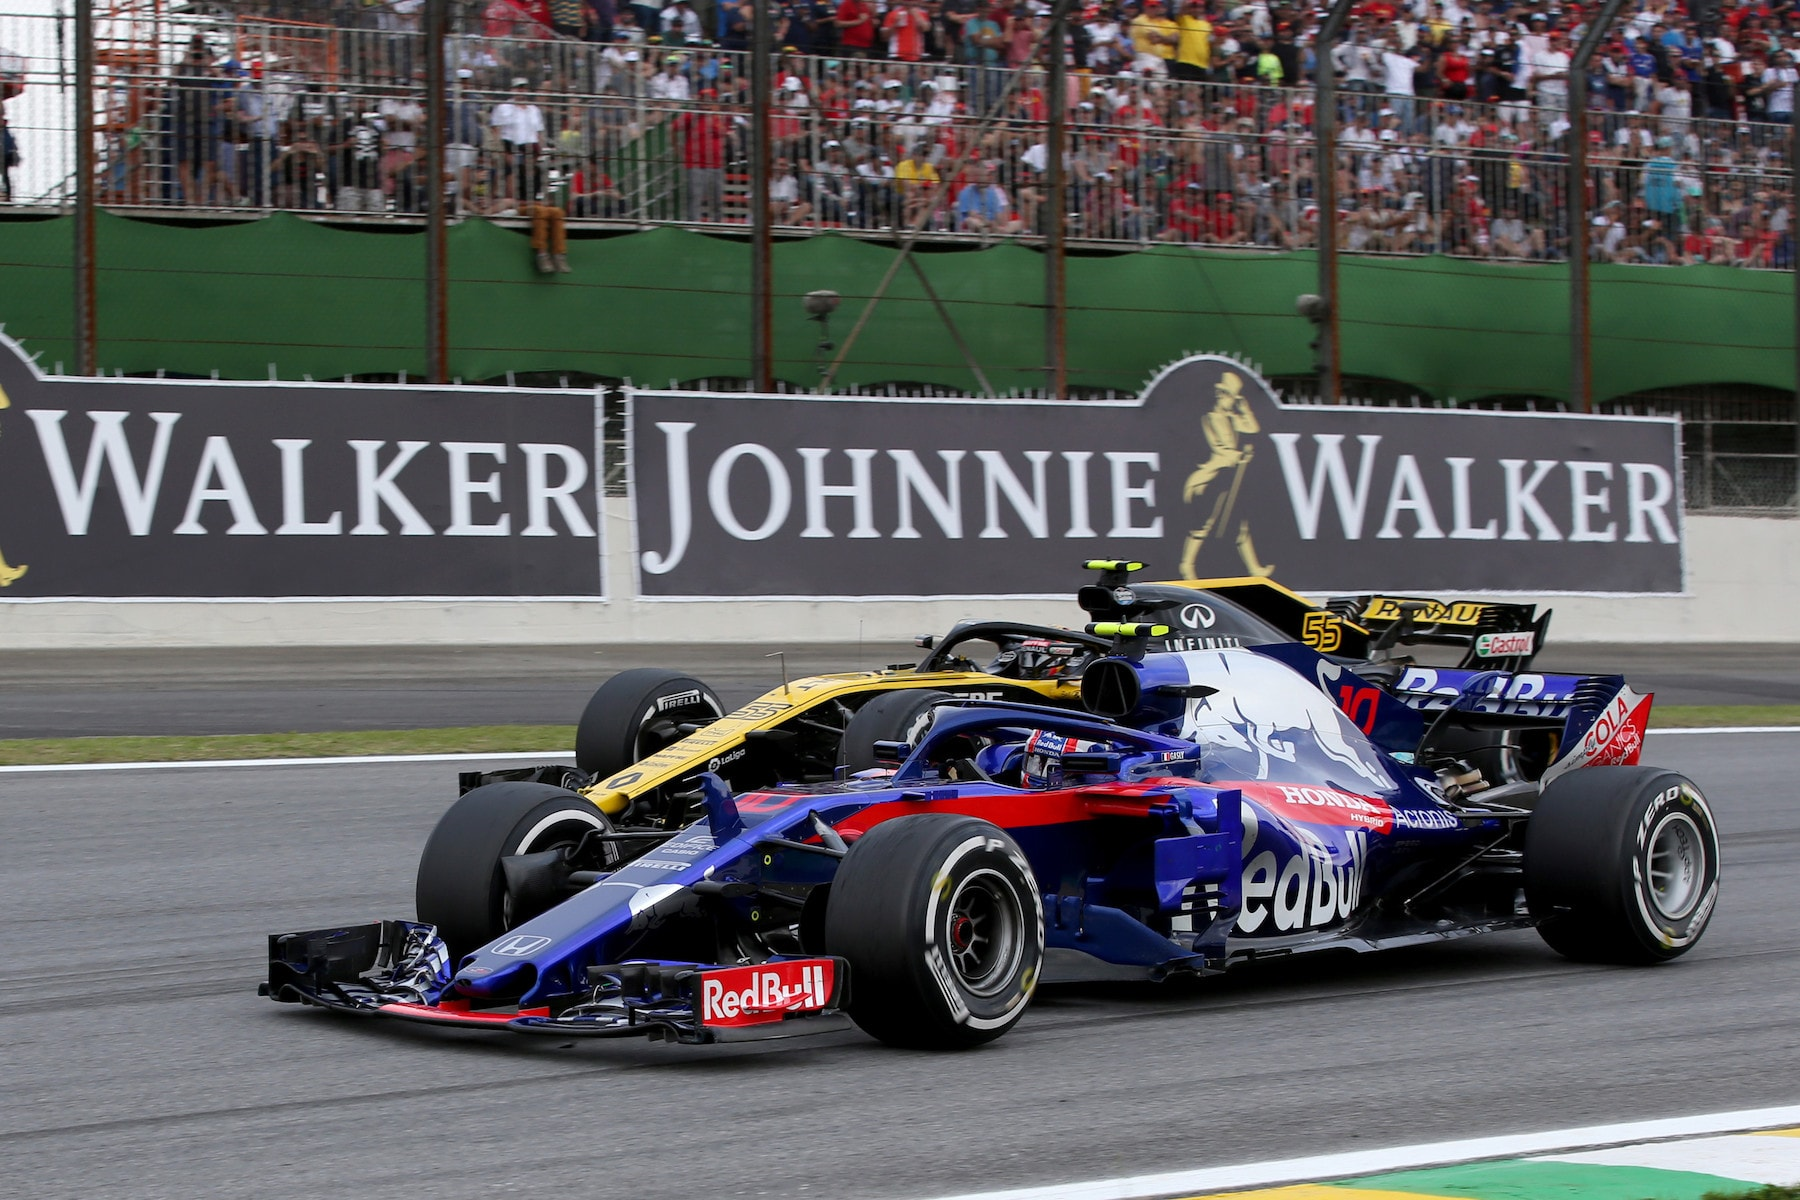 G 2018 Pierre Gasly | Toro Rosso STR13 | 2018 Brazilian GP 3 copy.jpg